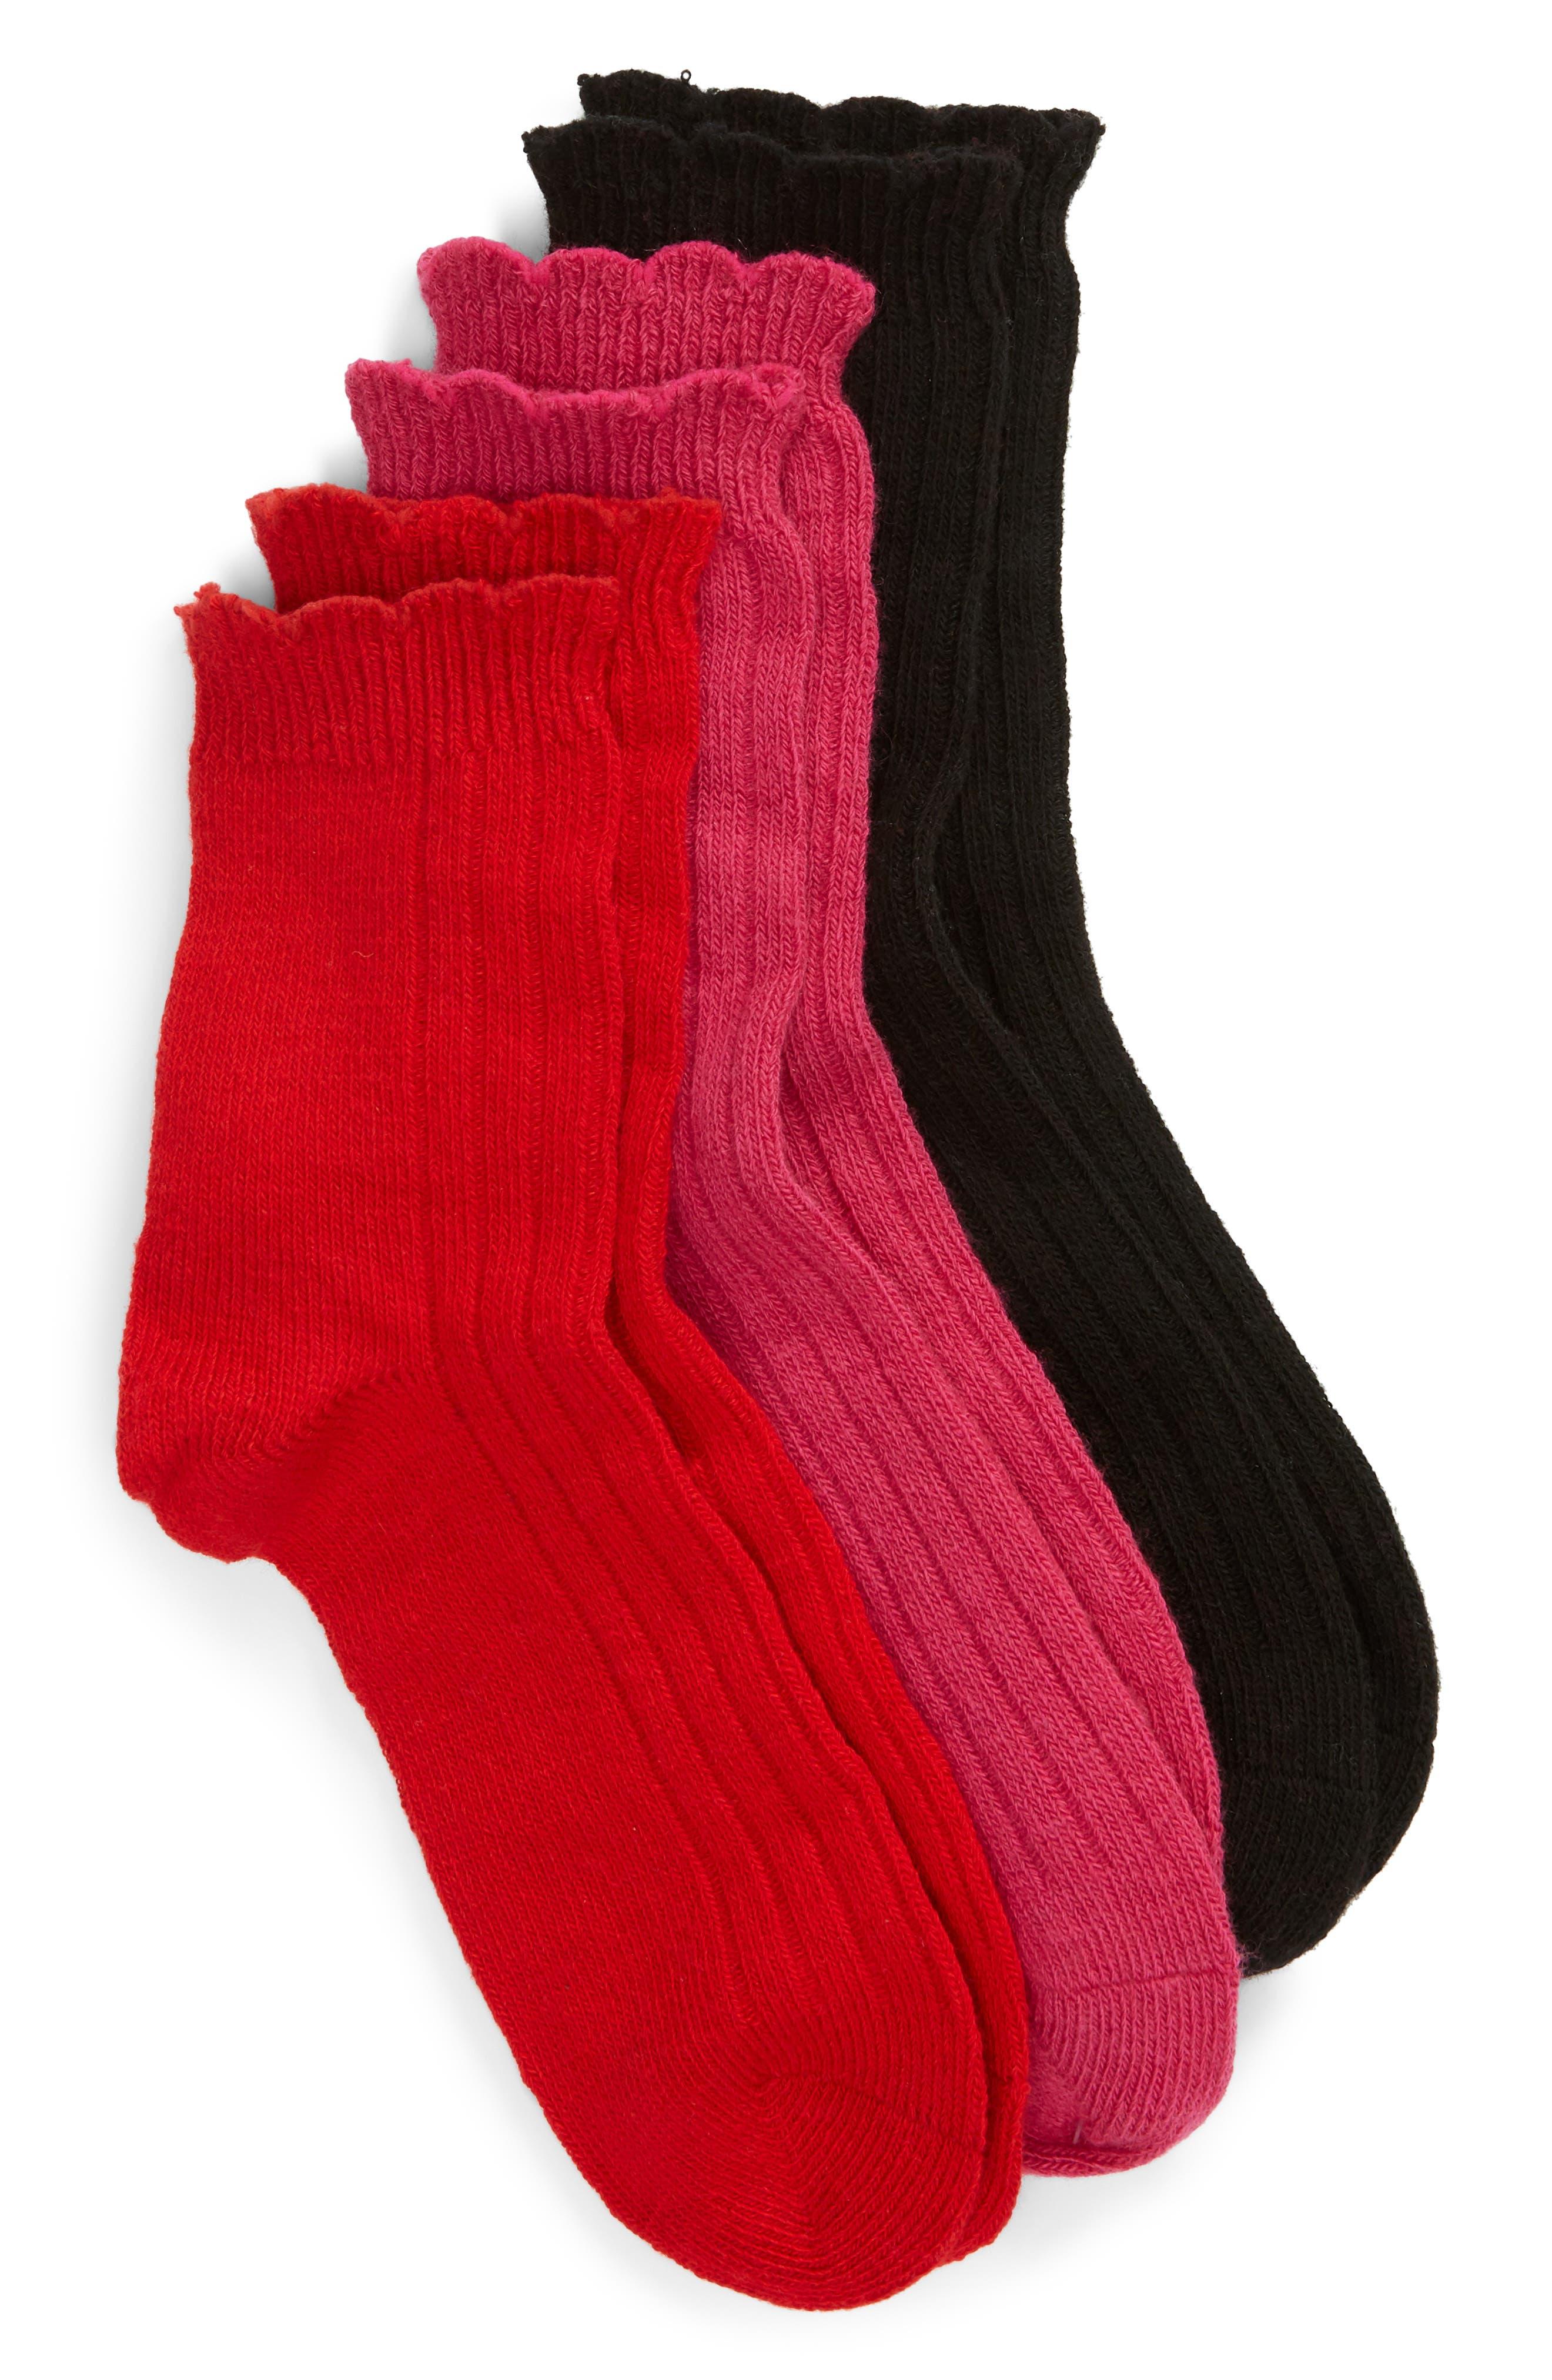 Assorted 3-Pack Crew Socks,                             Main thumbnail 1, color,                             MULTI 2